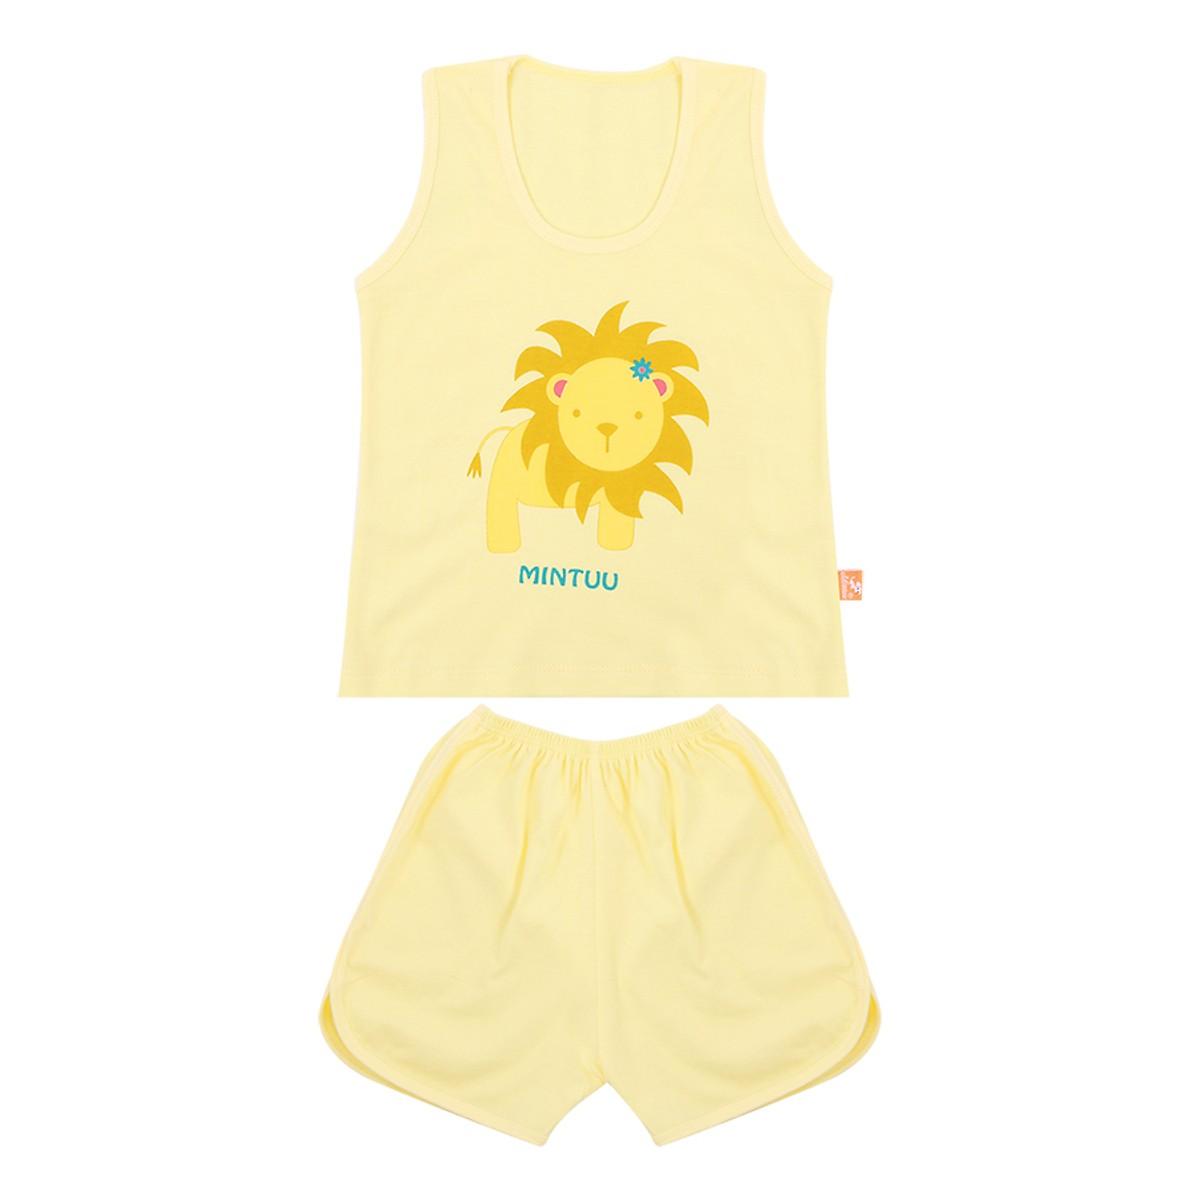 Bộ quần áo ba lỗ cho trẻ in màu Mintuu 522l